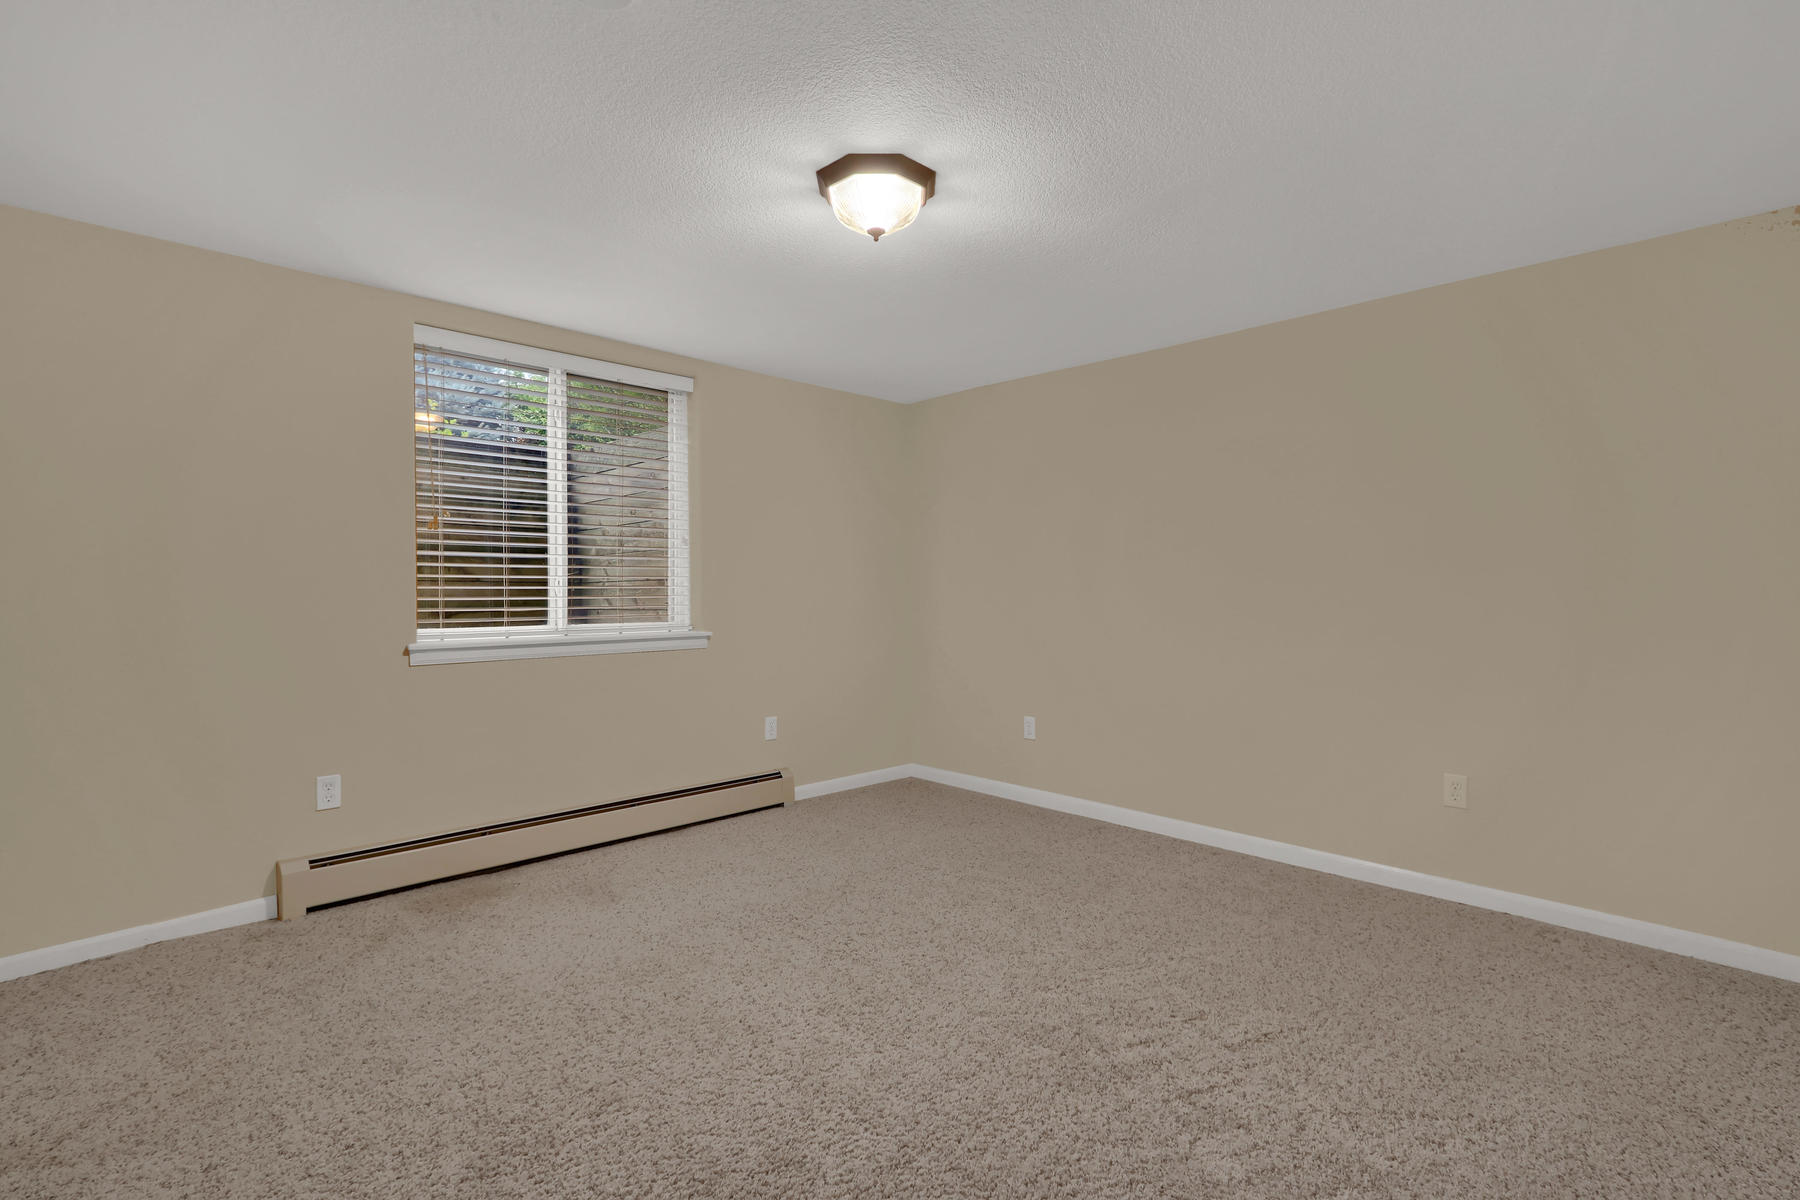 3845 Everett St Wheat Ridge CO-041-16-Bedroom-MLS_Size.jpg